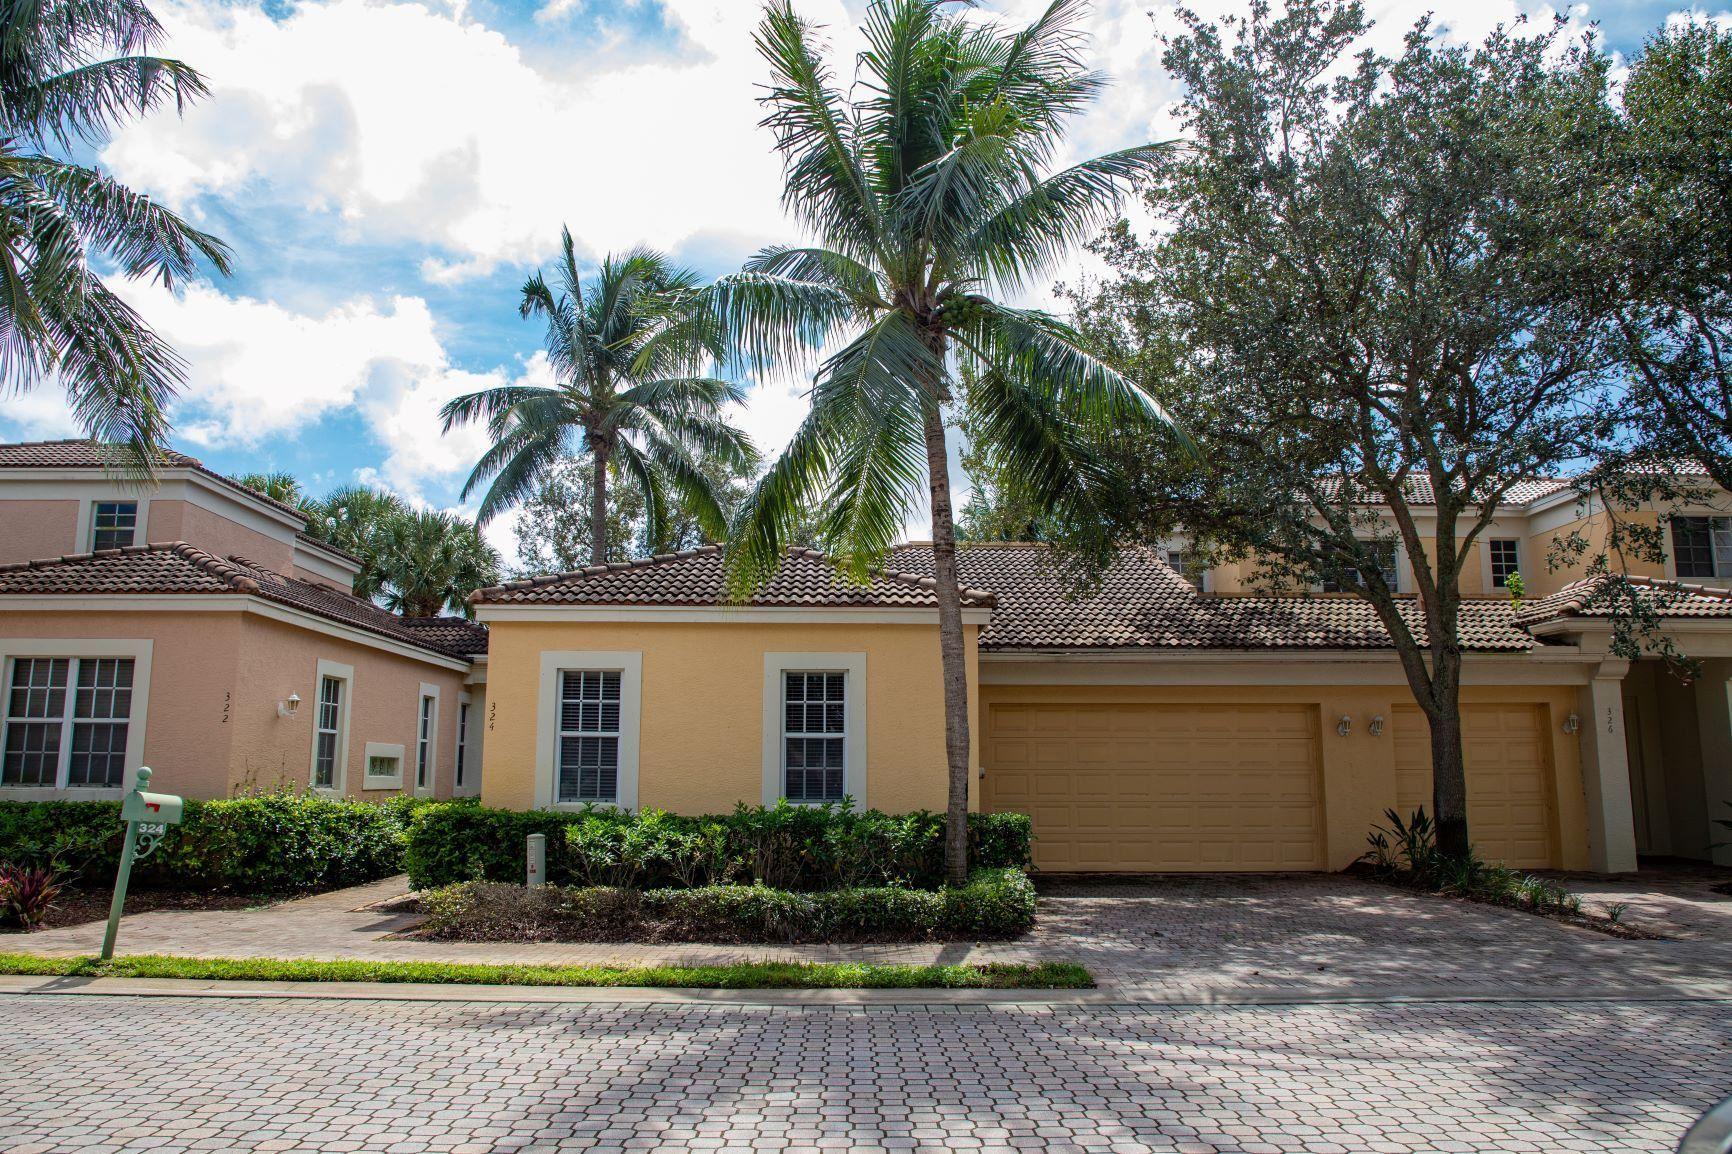 Photo of 324 Commons Way, Palm Beach Gardens, FL 33418 (MLS # RX-10662461)